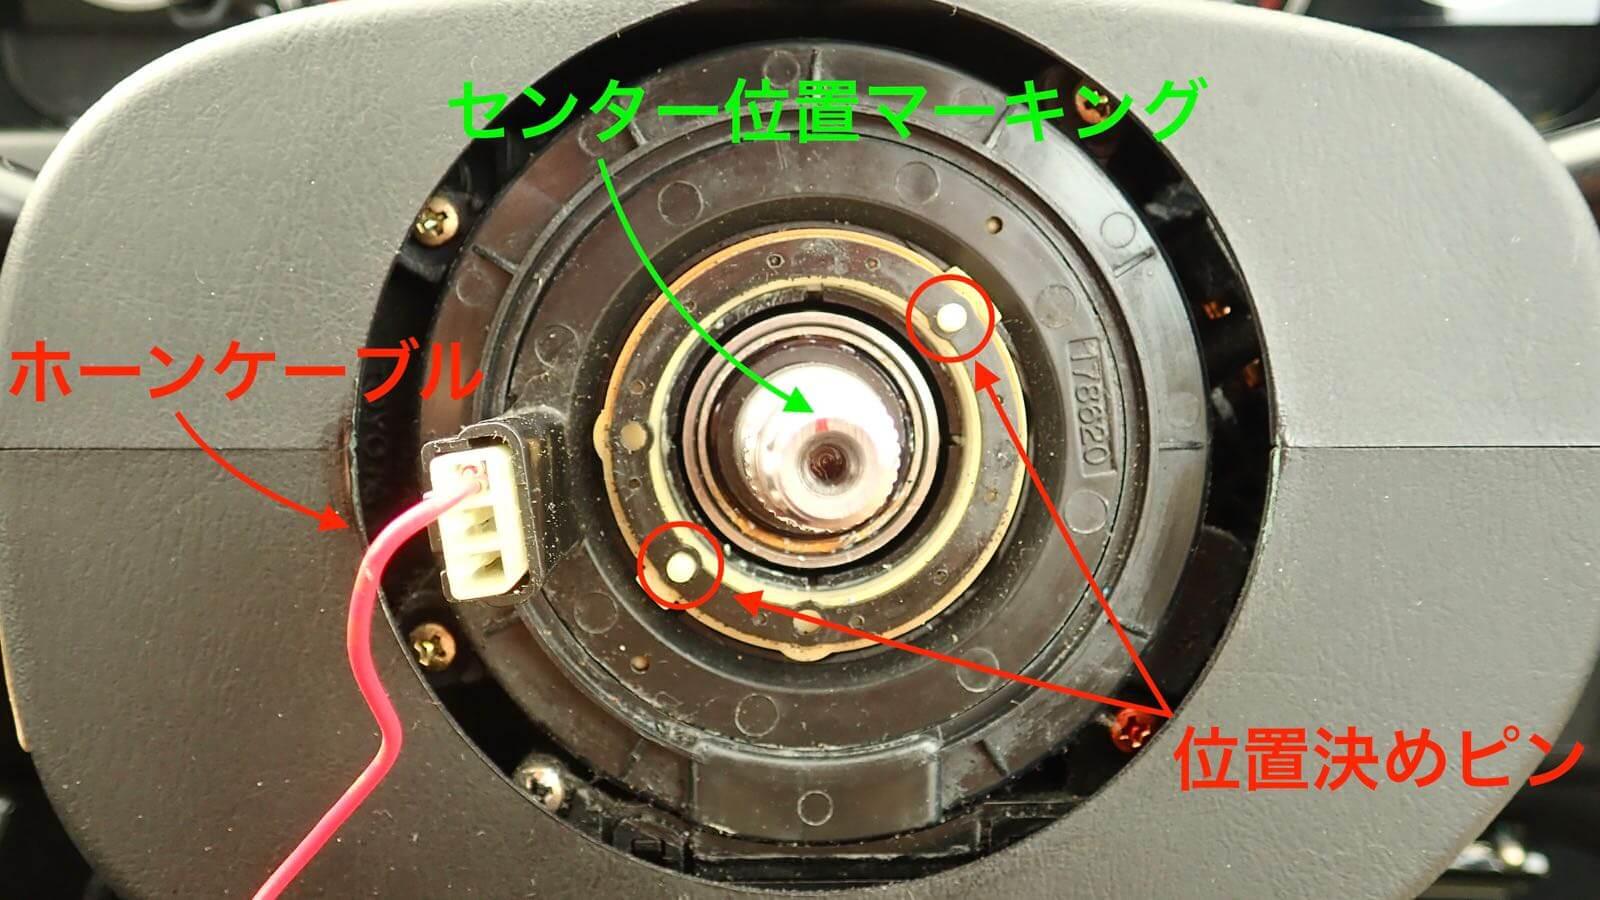 0207 MR2 Works Bell Rapfix2 installation method 16